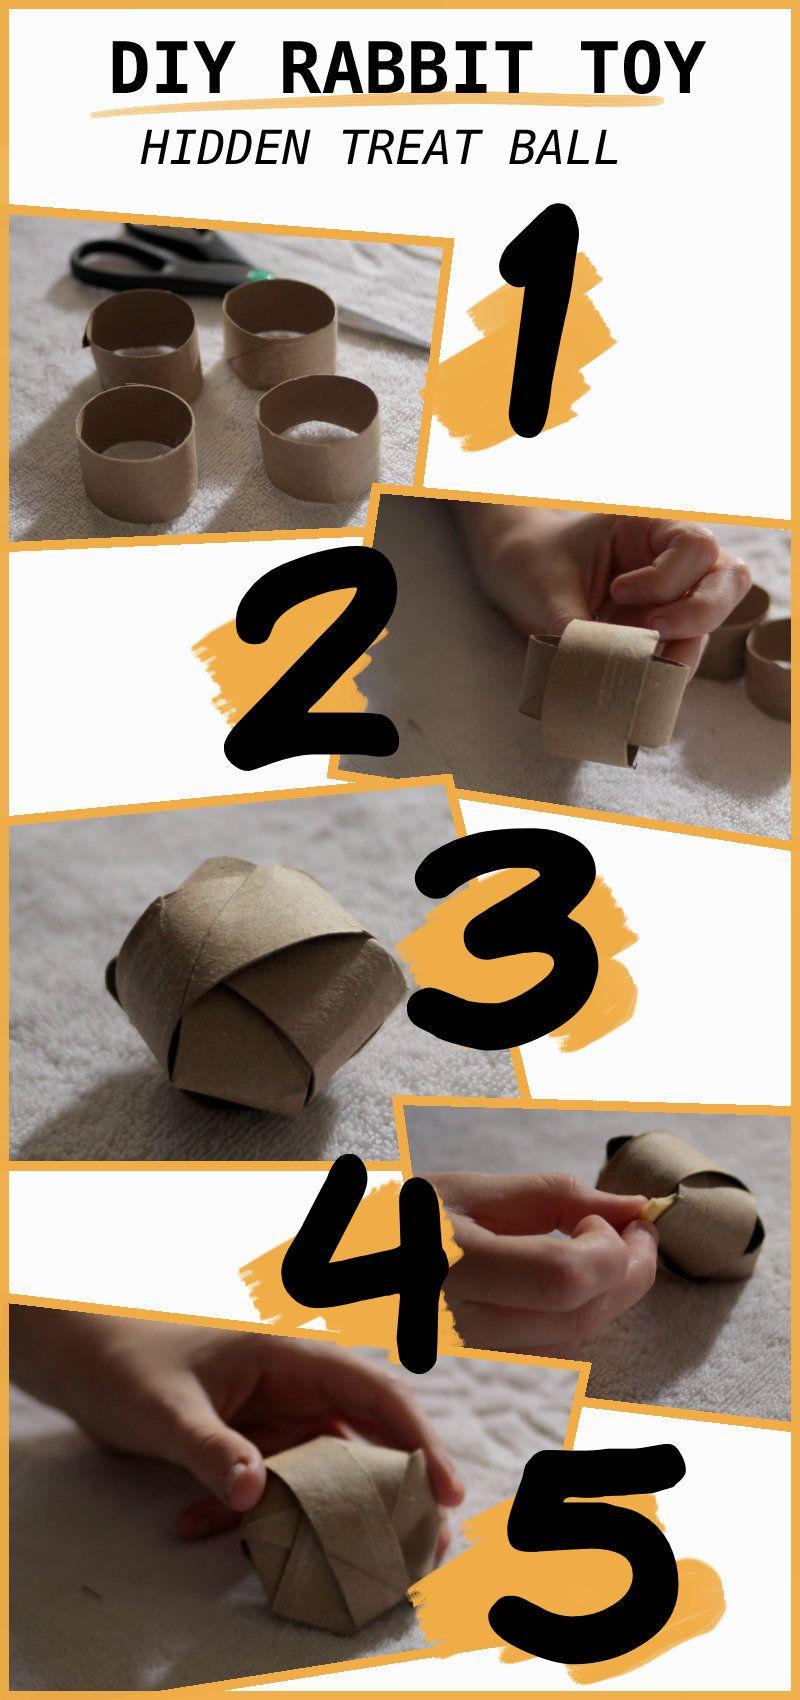 5 diy easy rabbit chew toys to make diy bunny toys